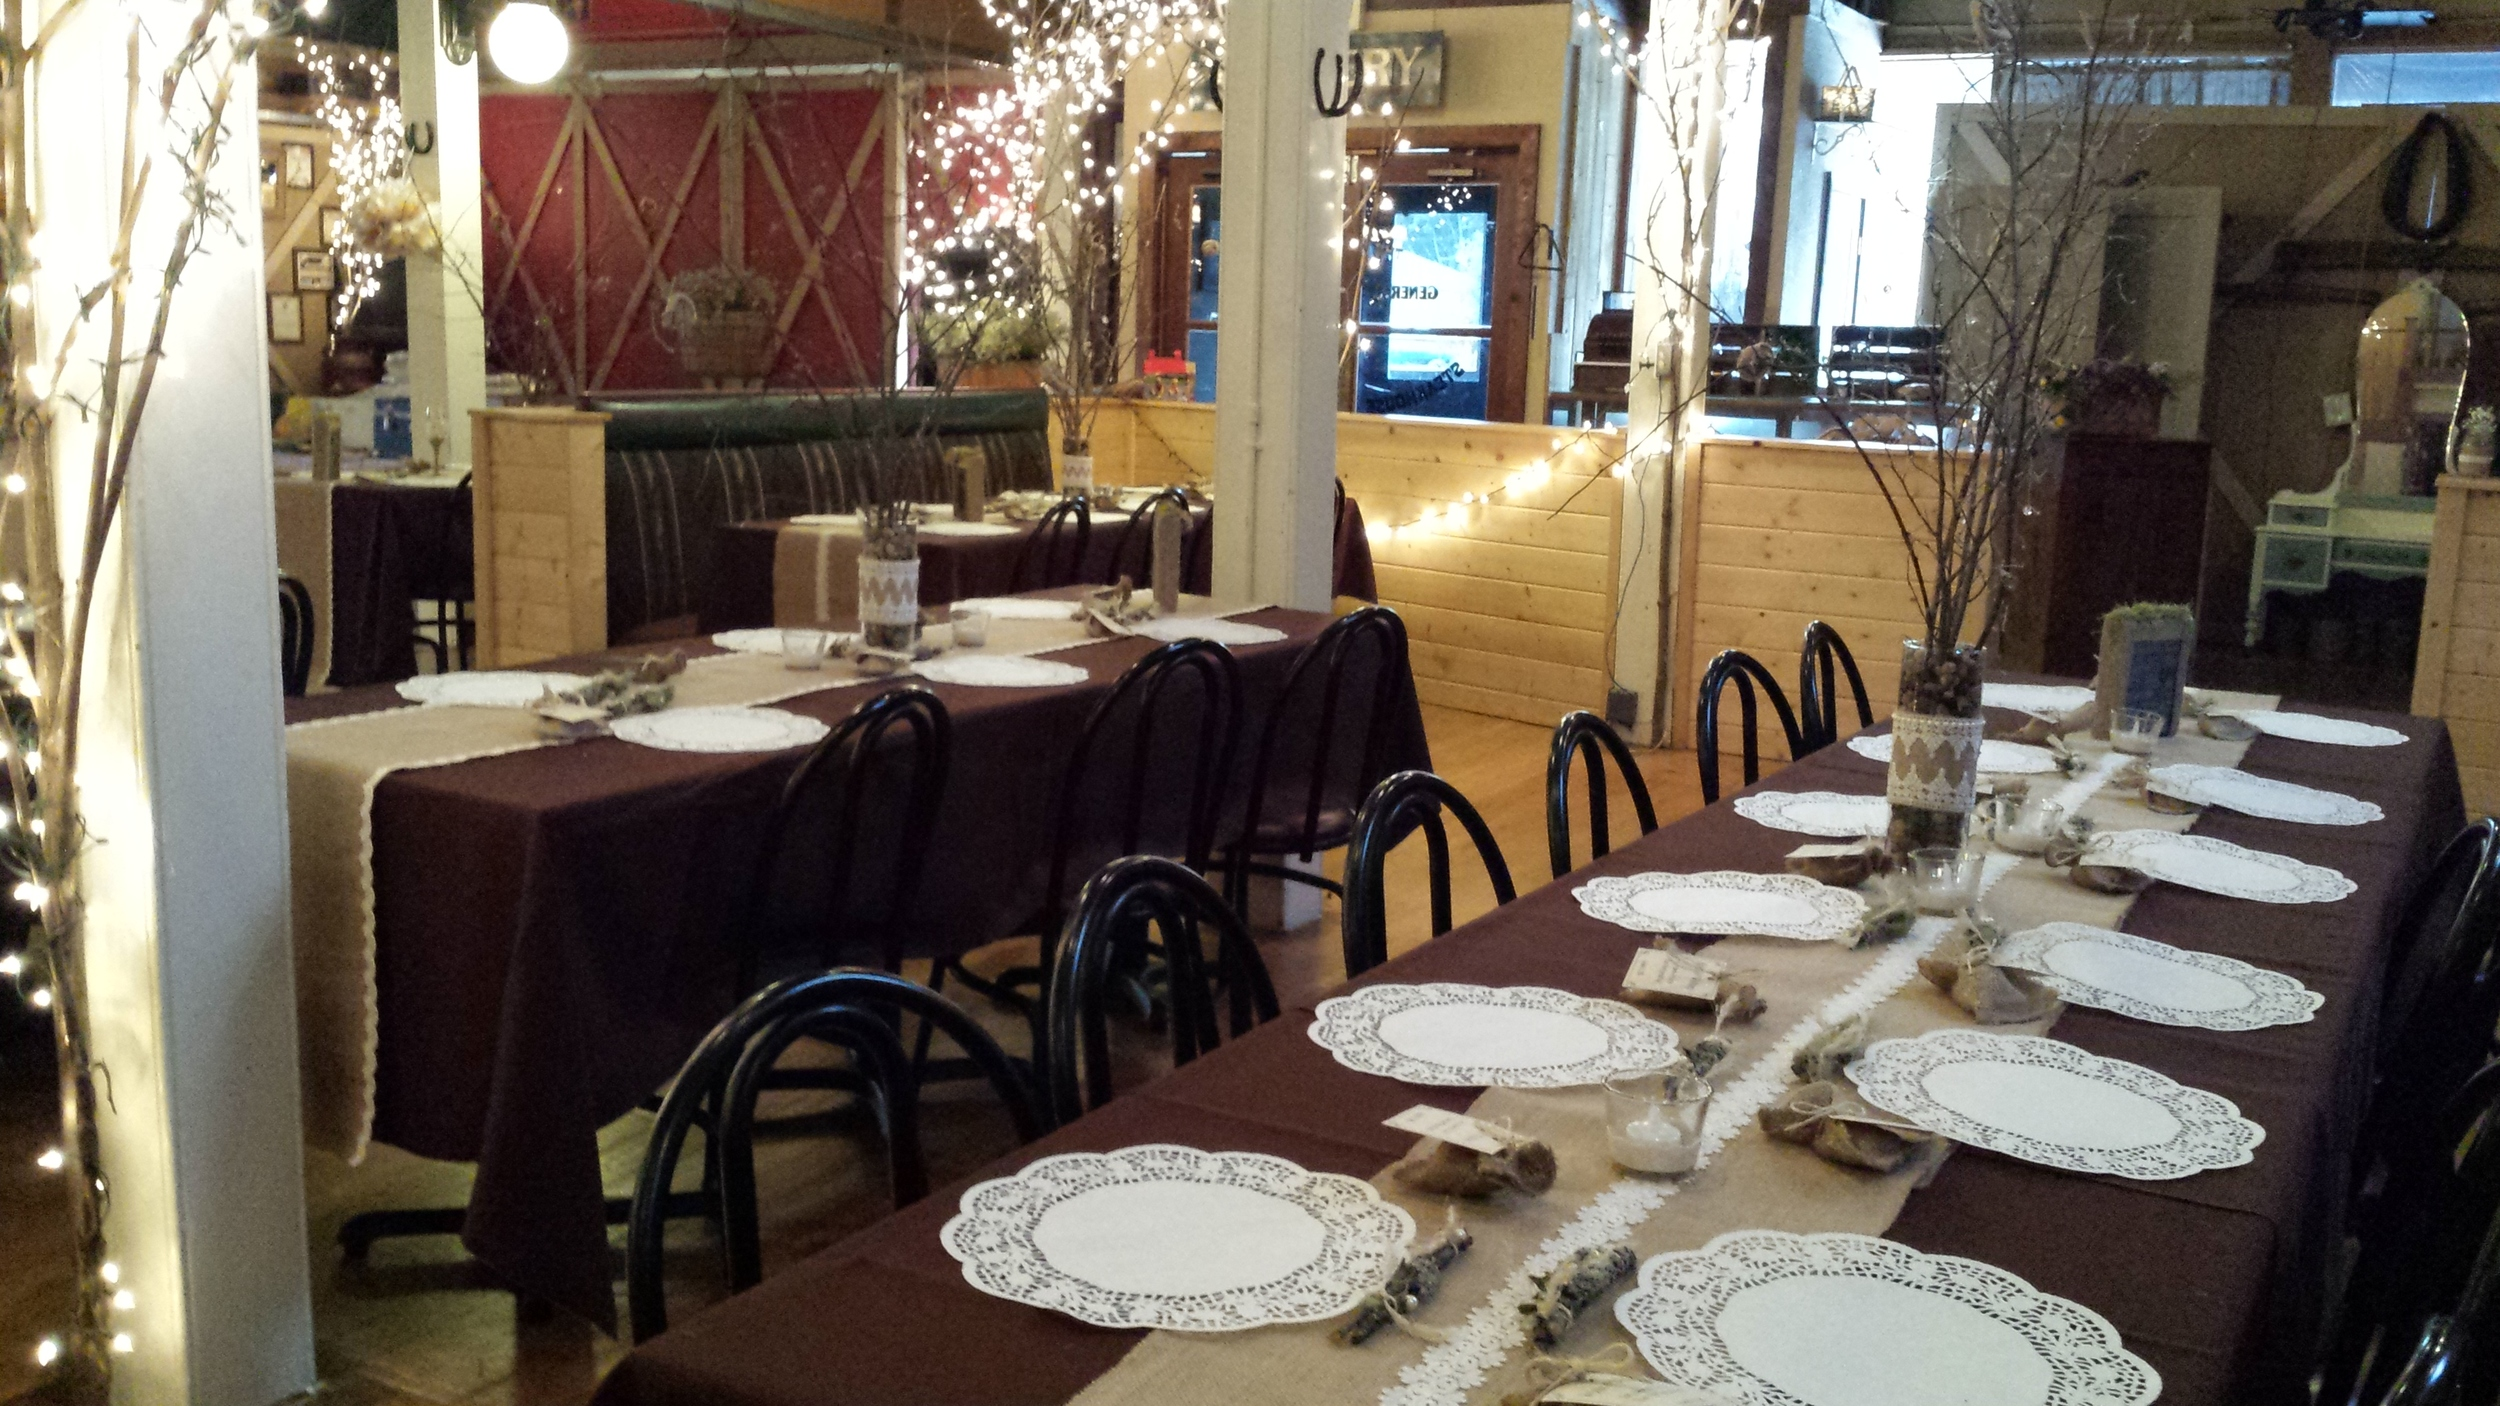 2 tables,brown,w front doors in view - Copy.jpg